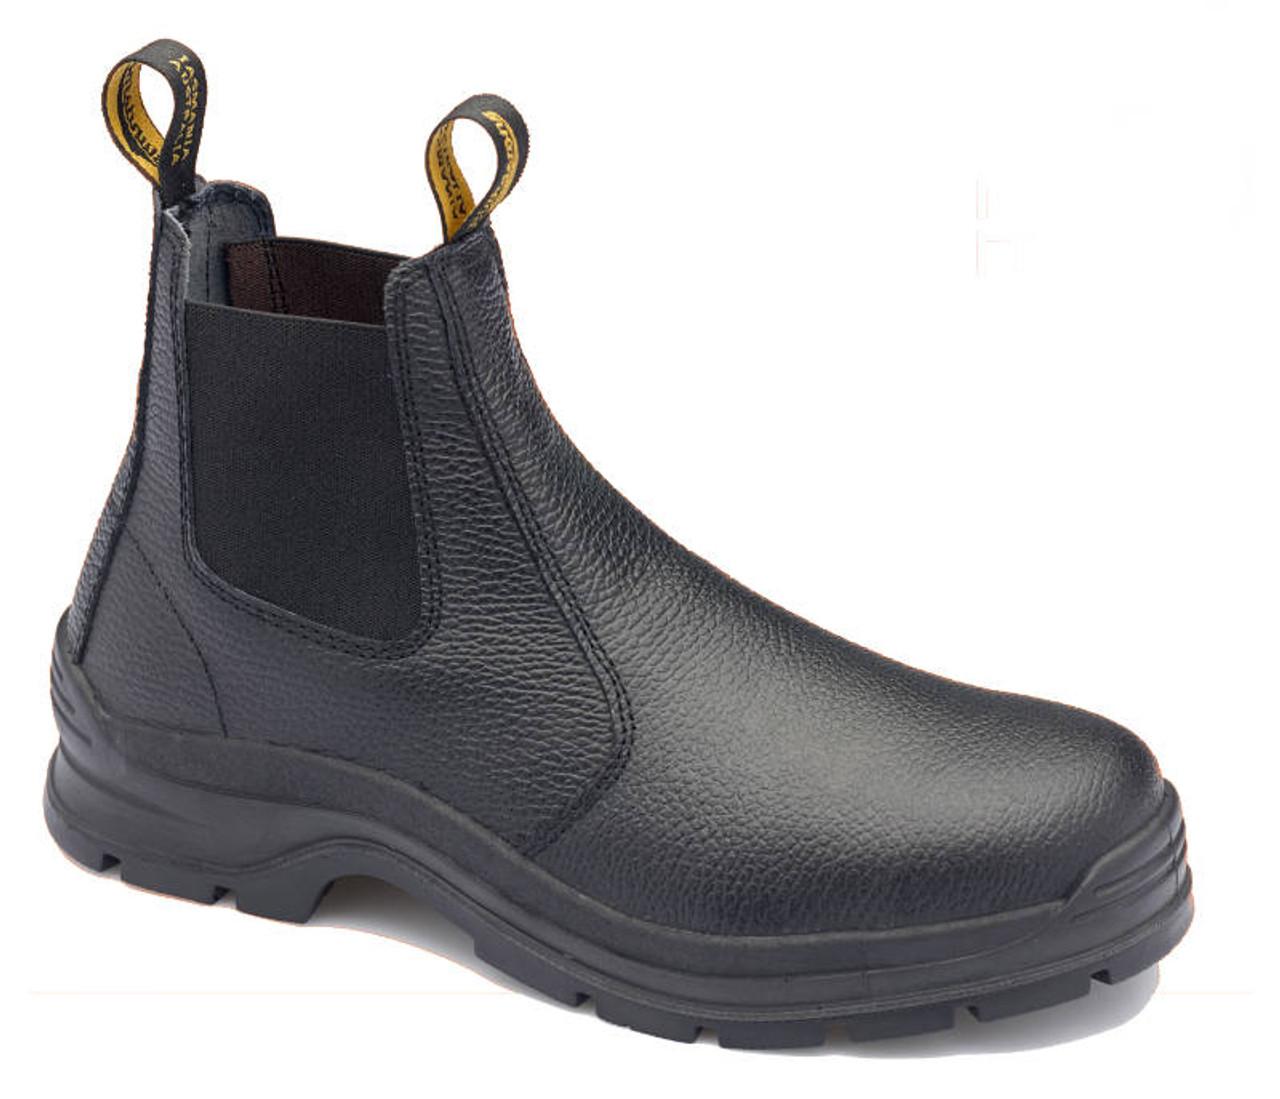 21d523346f7 Blundstone 310 Black Rambler print leather elastic side Steel Cap safety  boots